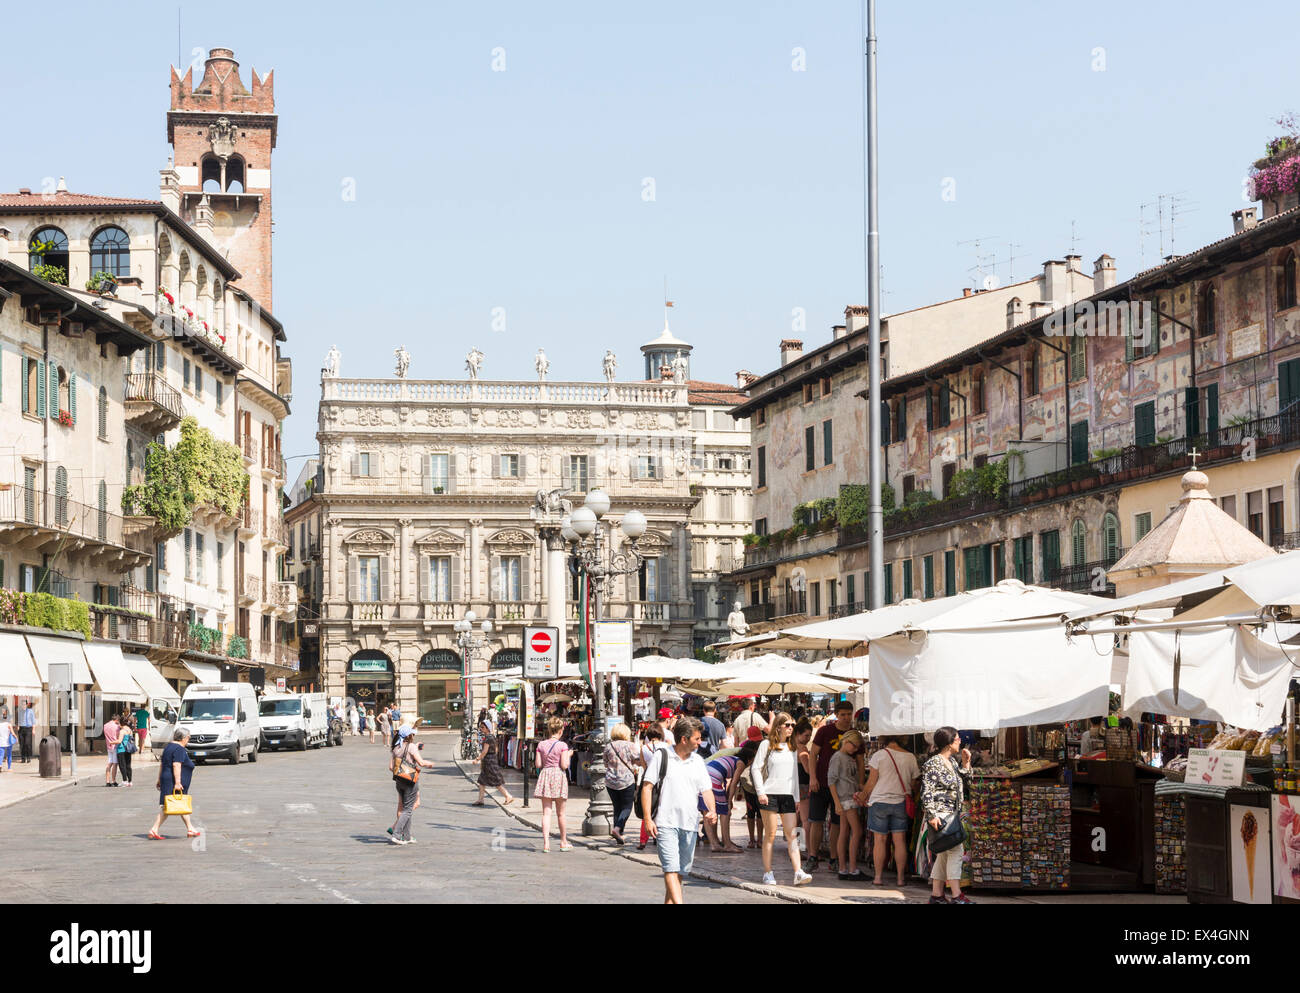 VERONA, Italien - Juni 3: Touristen an der Piazza Delle Erbe in der Altstadt von Verona, Italien am 3. Juni 2015. Stockbild